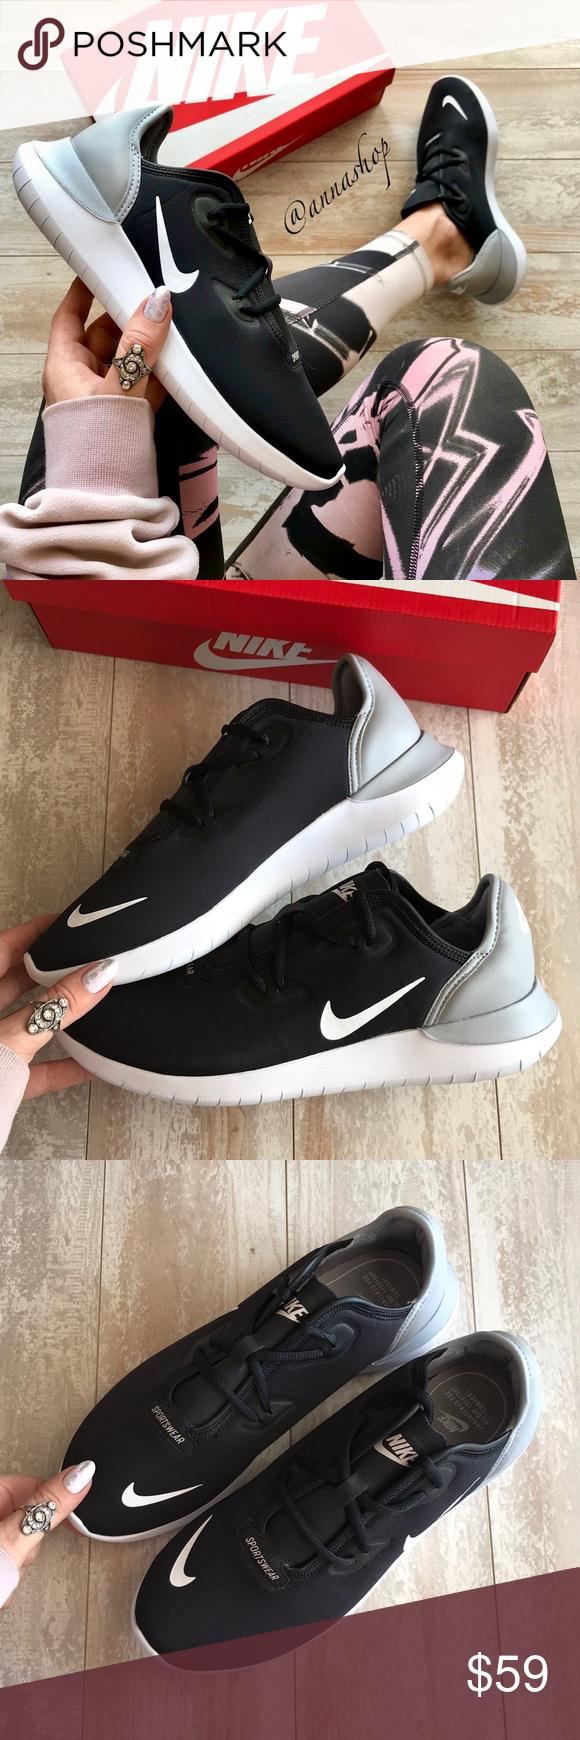 NWT Nike hakata Black   Clothes design